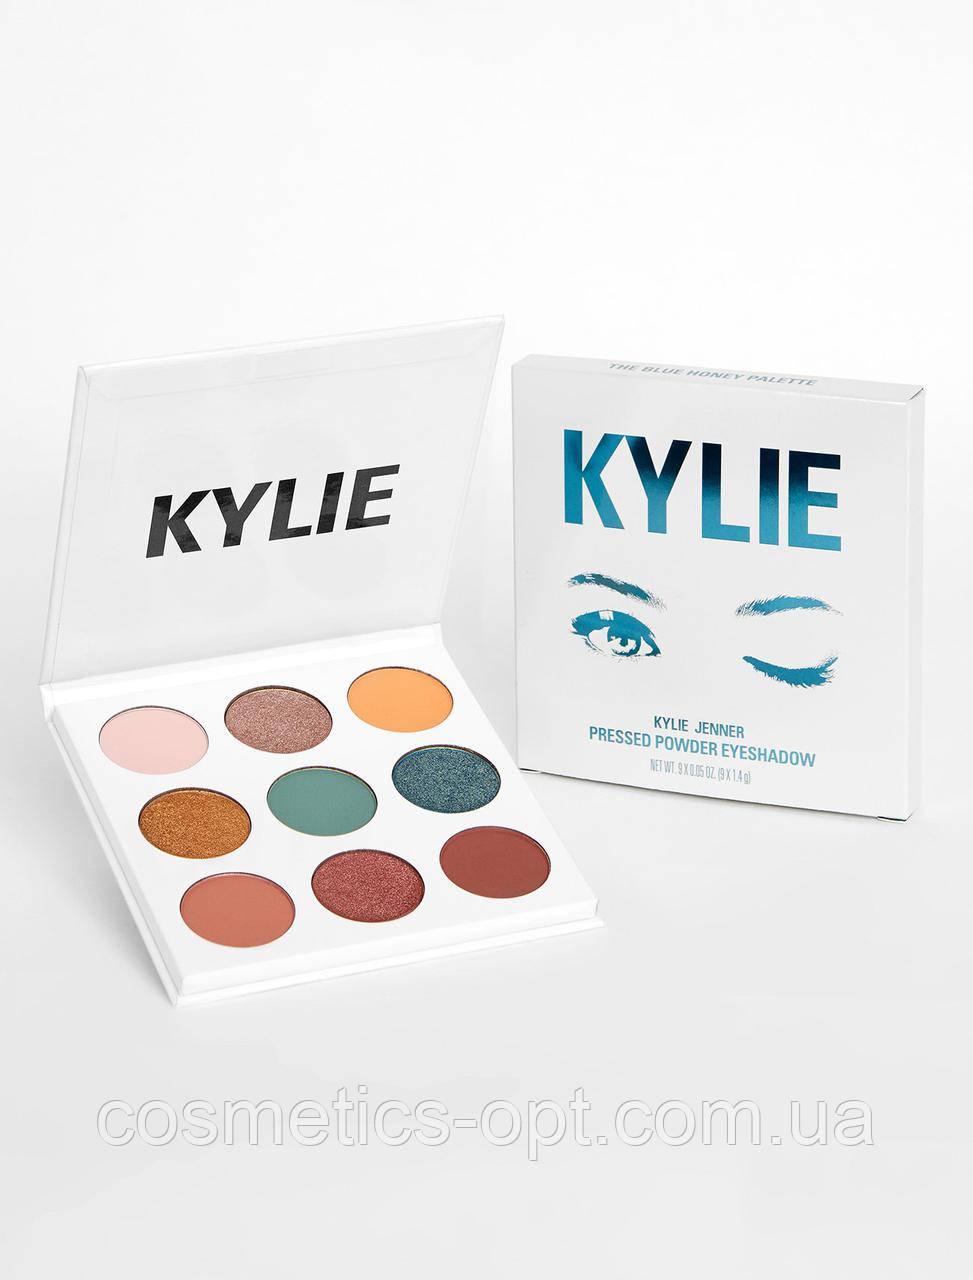 Тени для век Kylie THE BLUE HONEY PALETTE KYSHADOW (реплика)